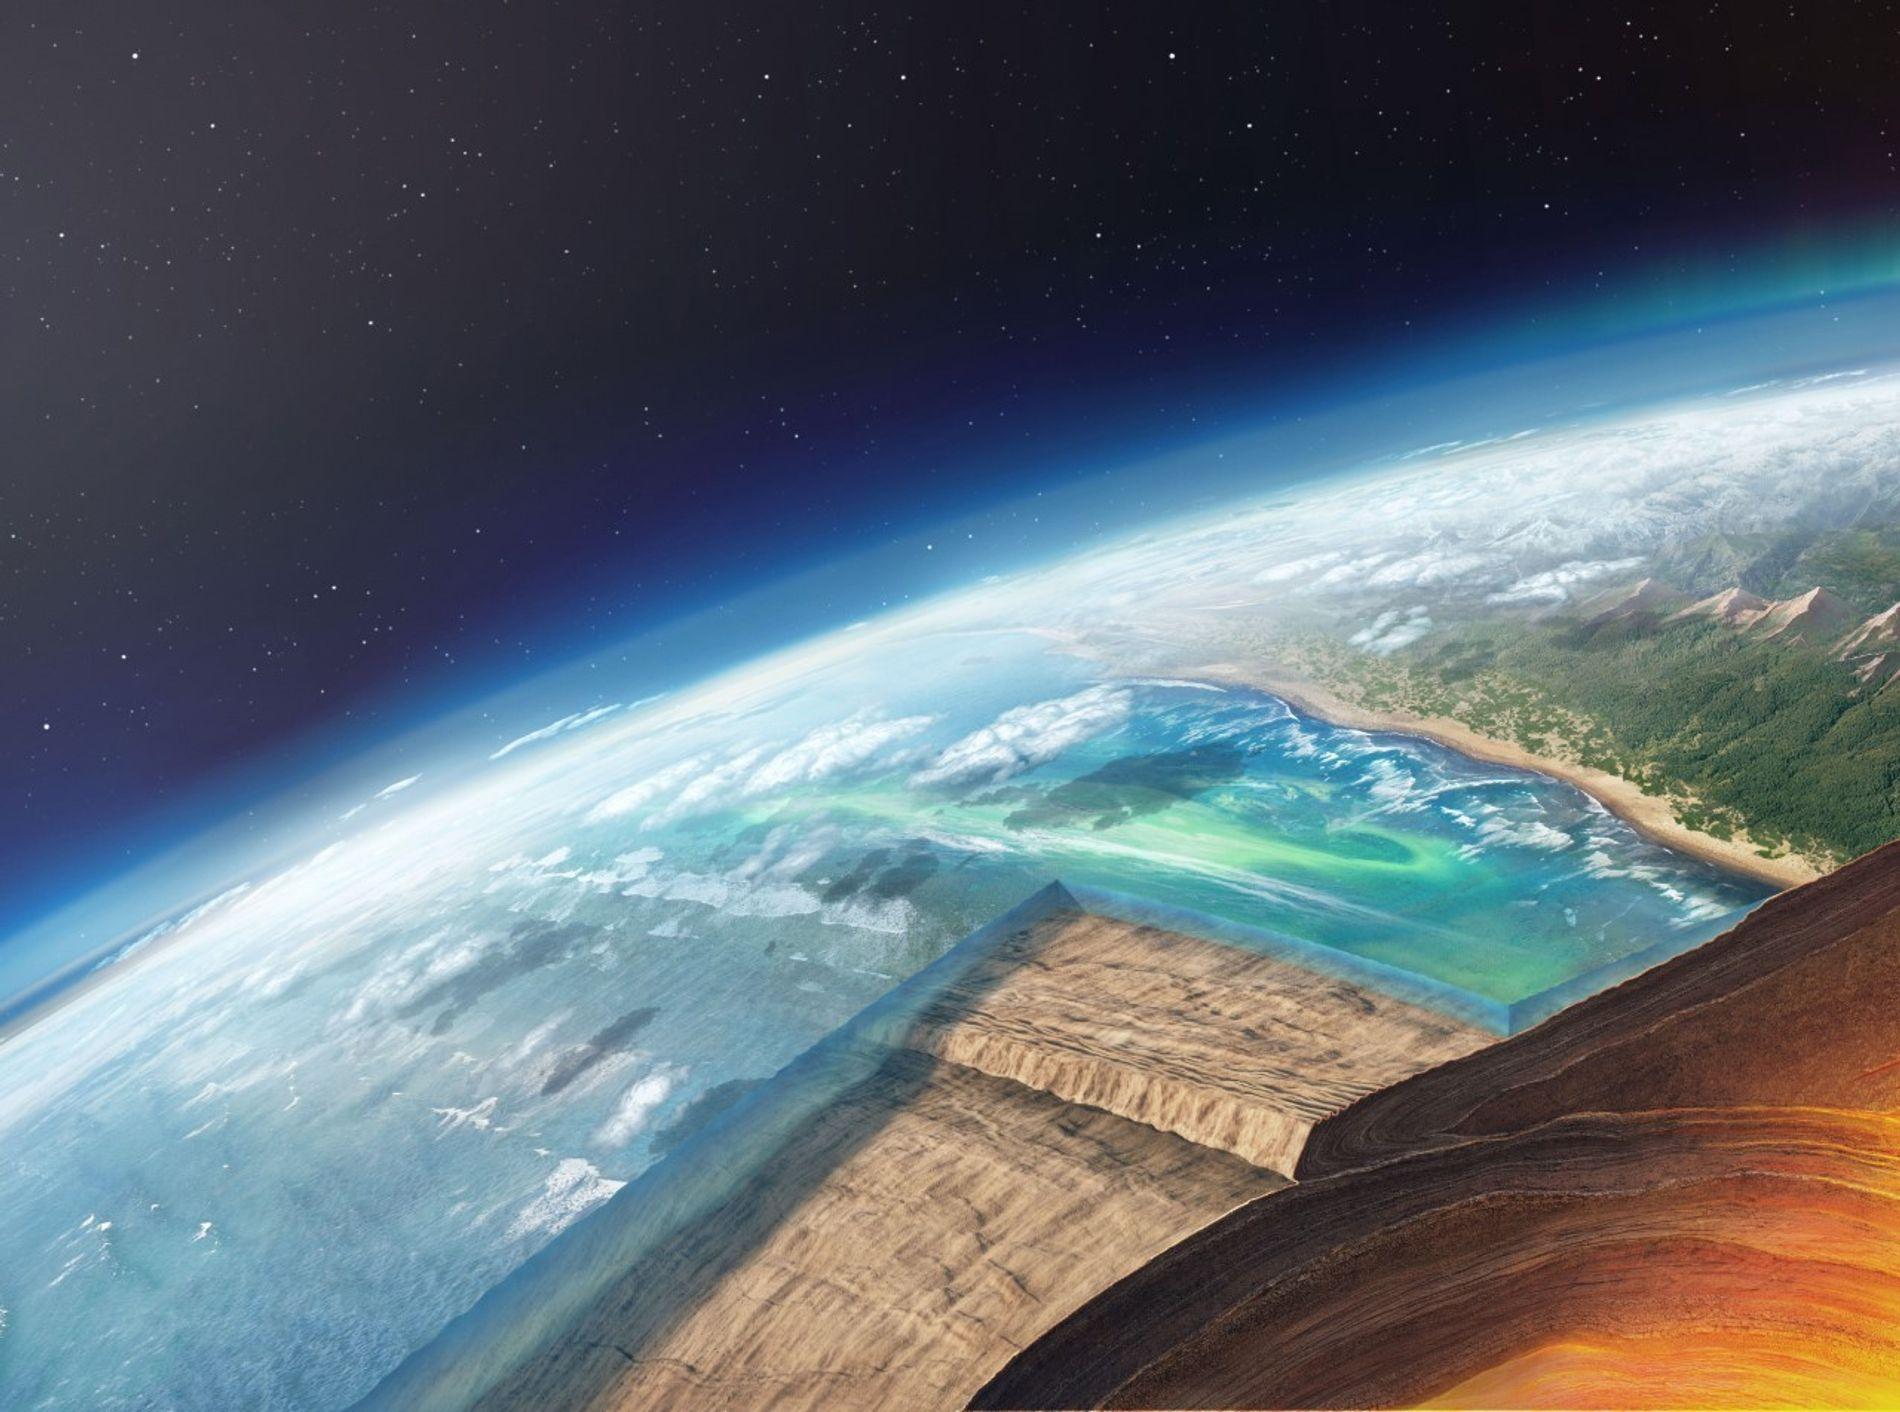 Placa oceánica